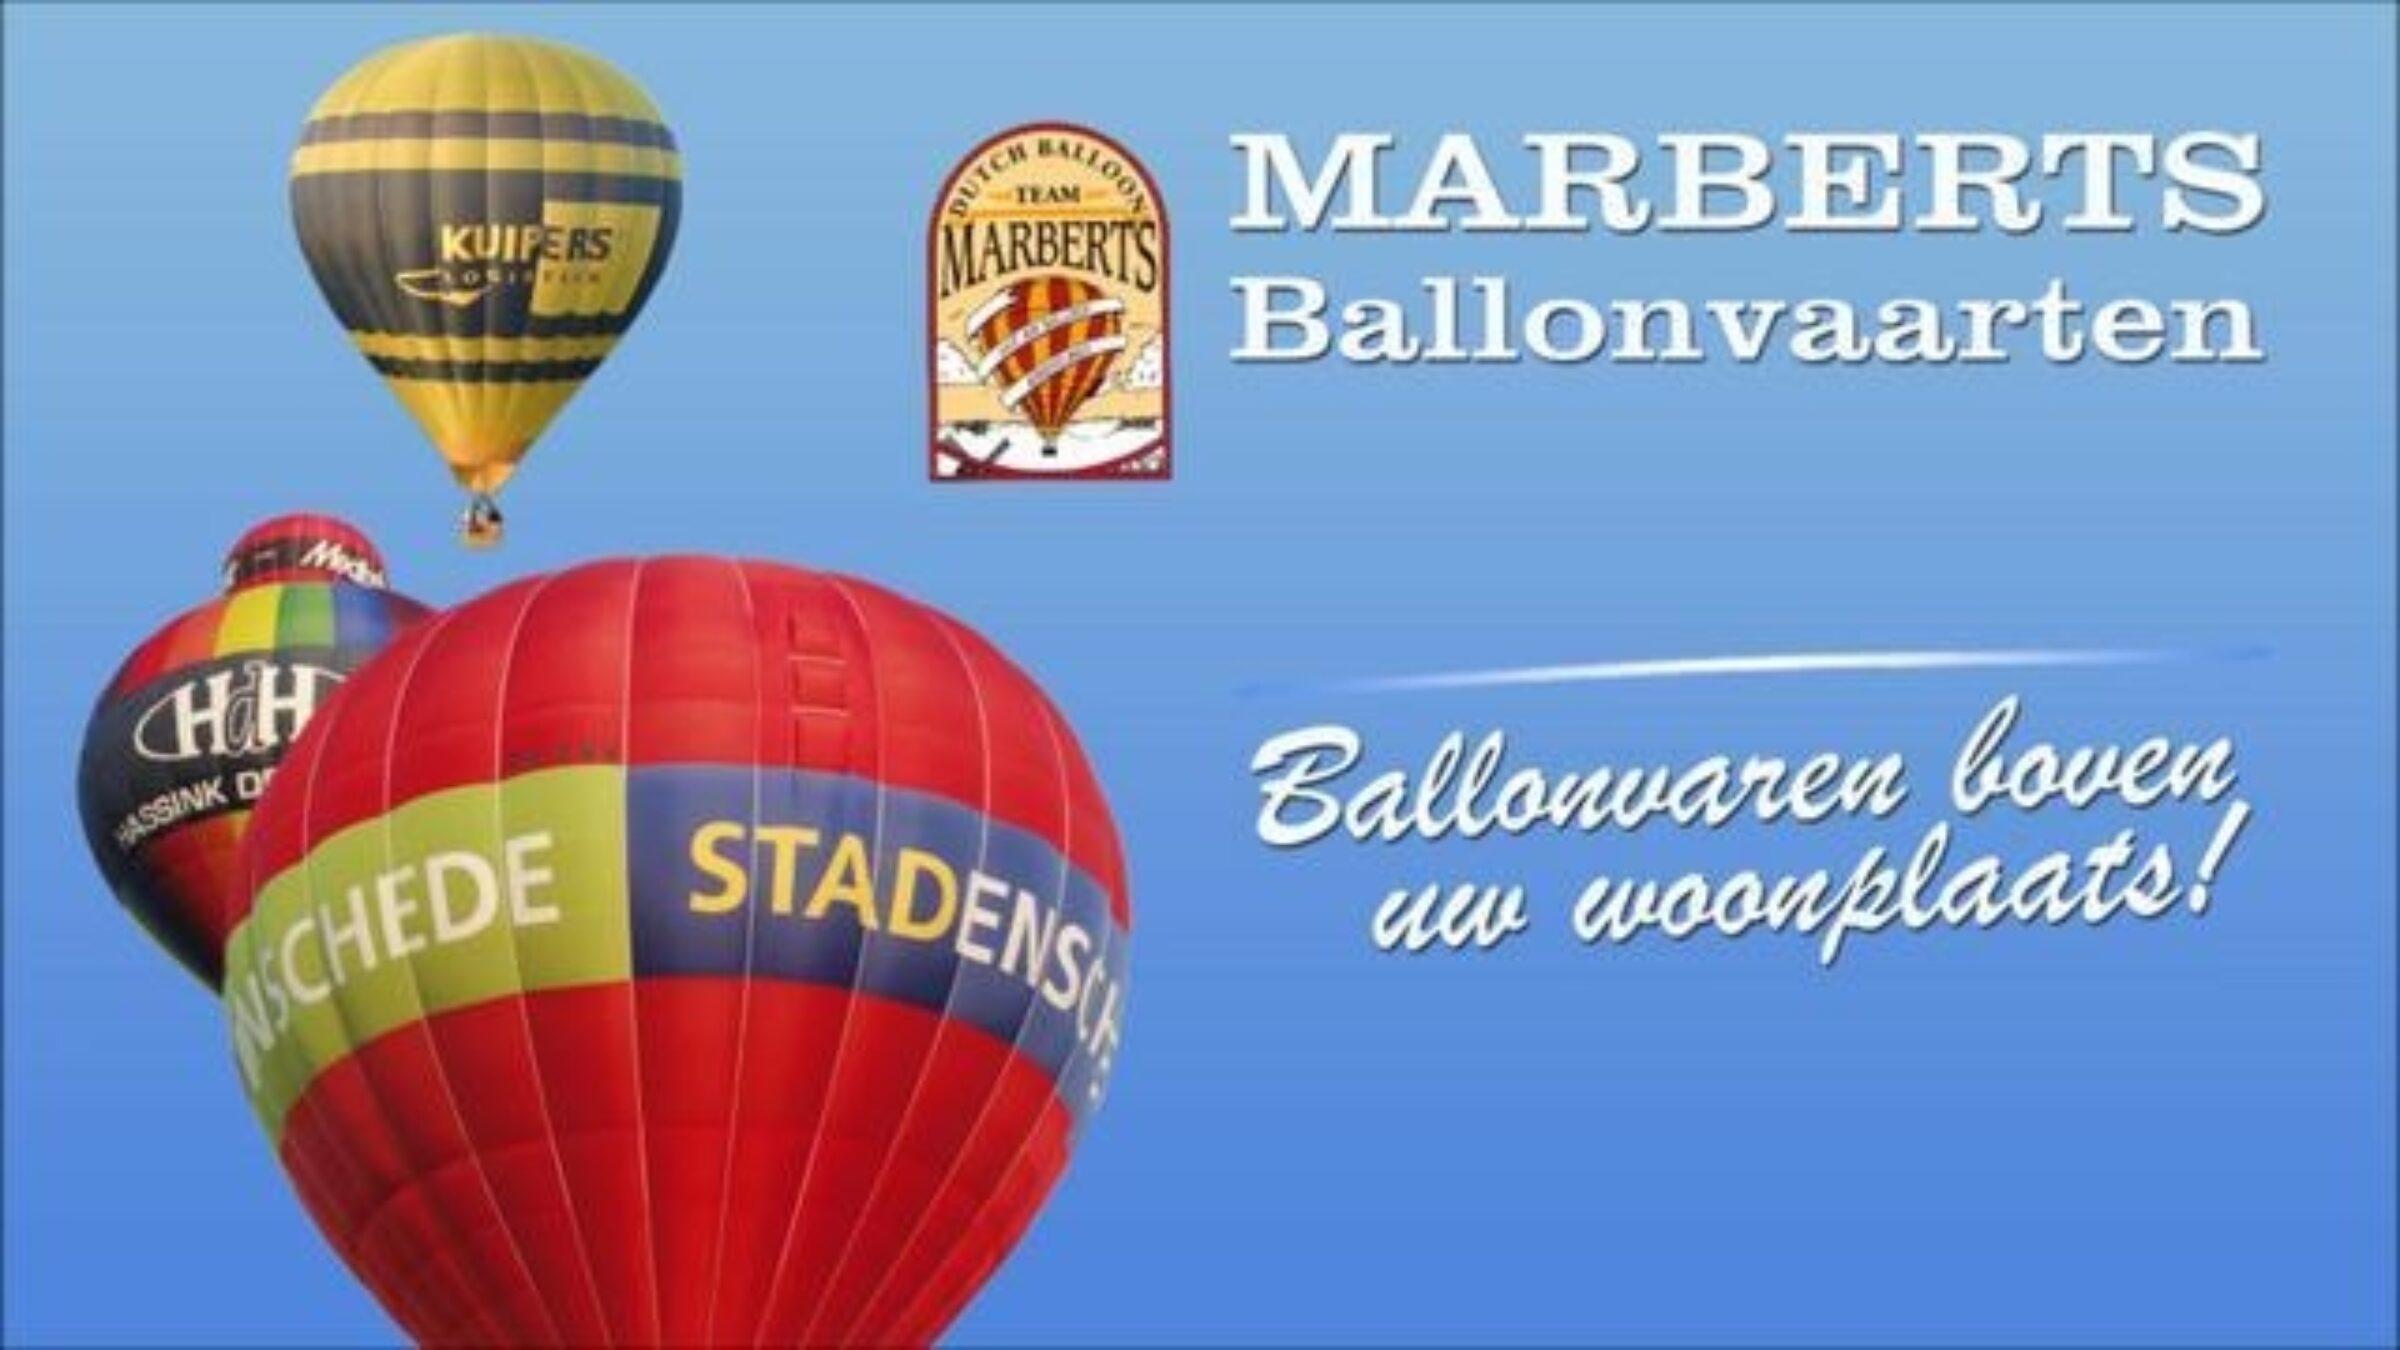 Ballonvaarten Marberts Enschede